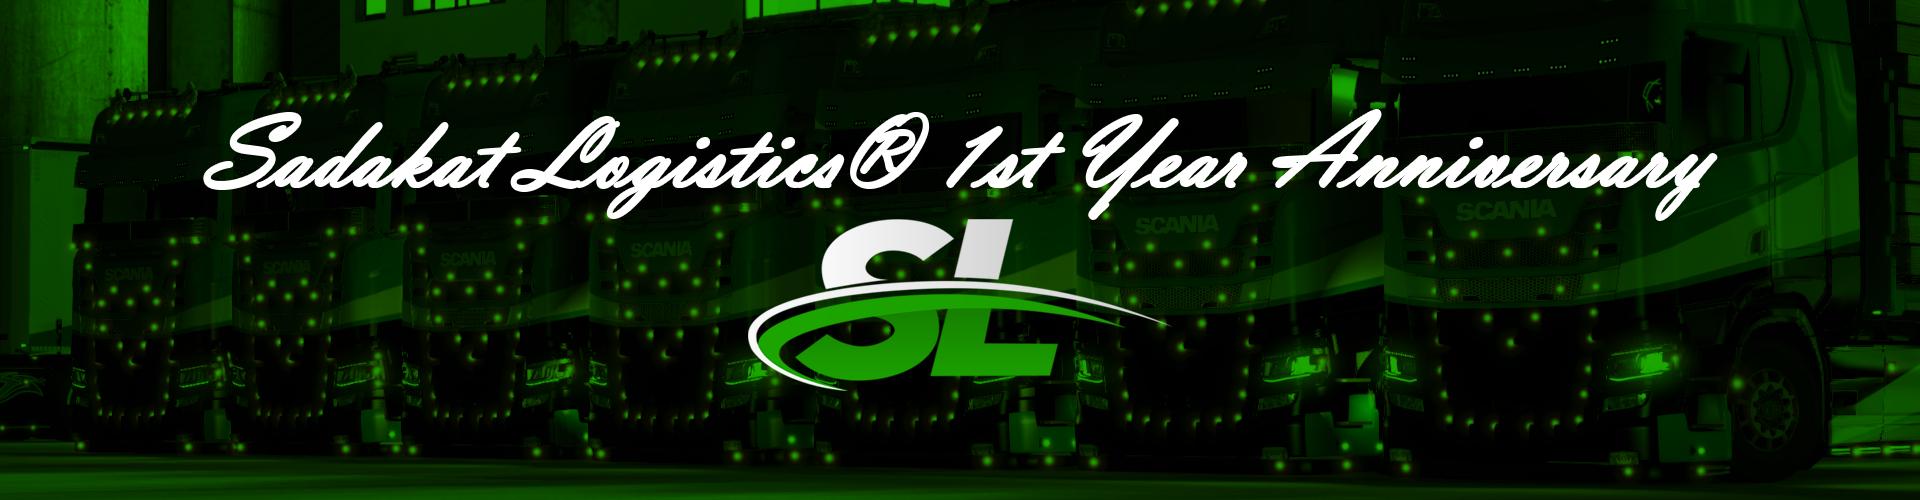 Sadakat Logistics® 1st Year Anniversary